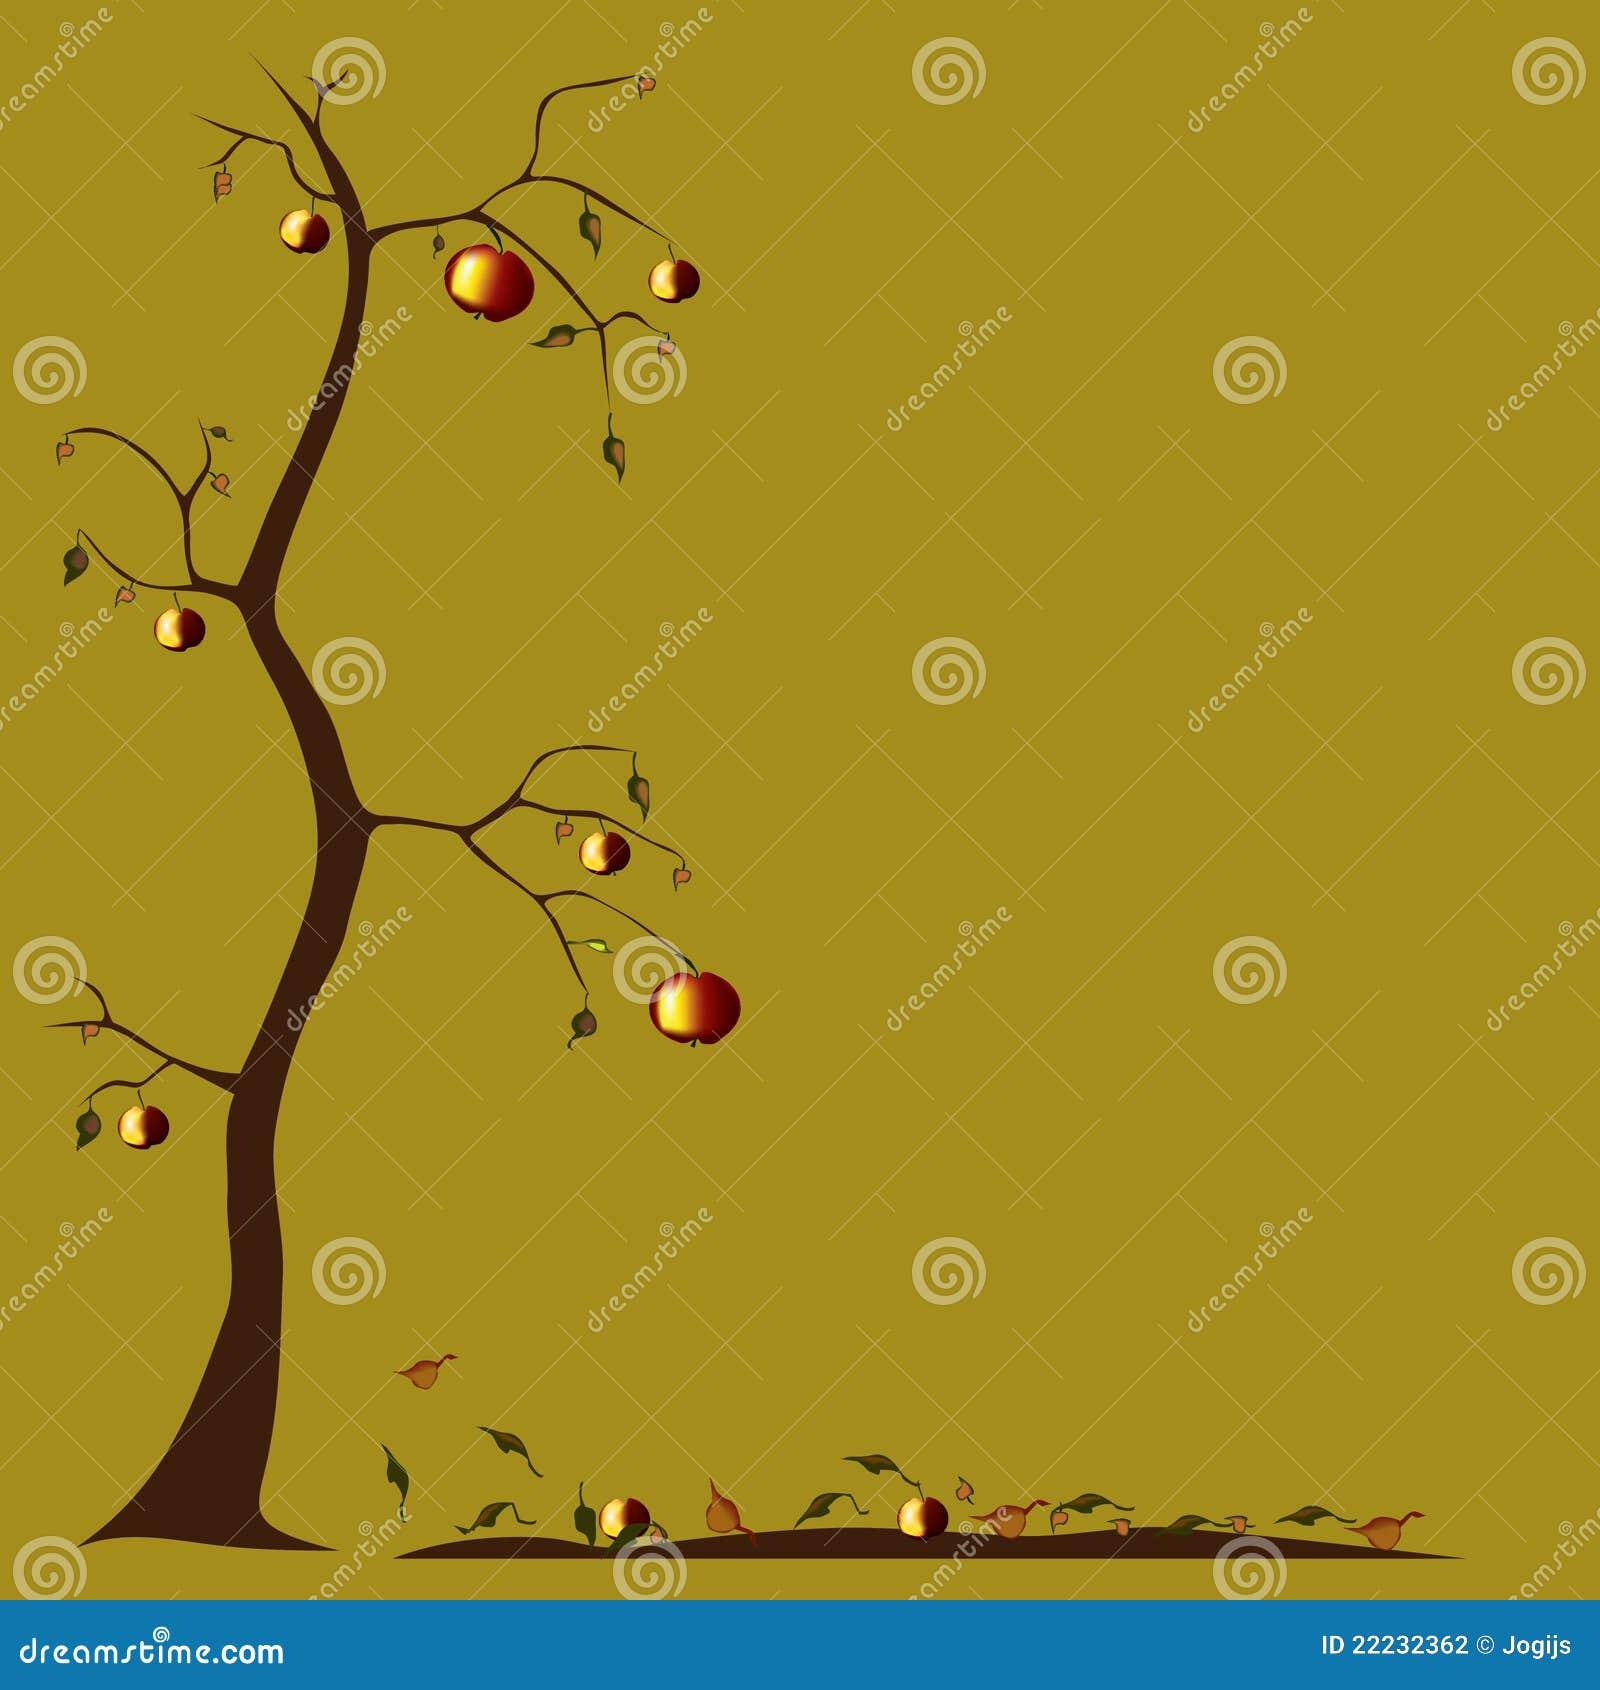 Botanical garden trees free desktop background free ...